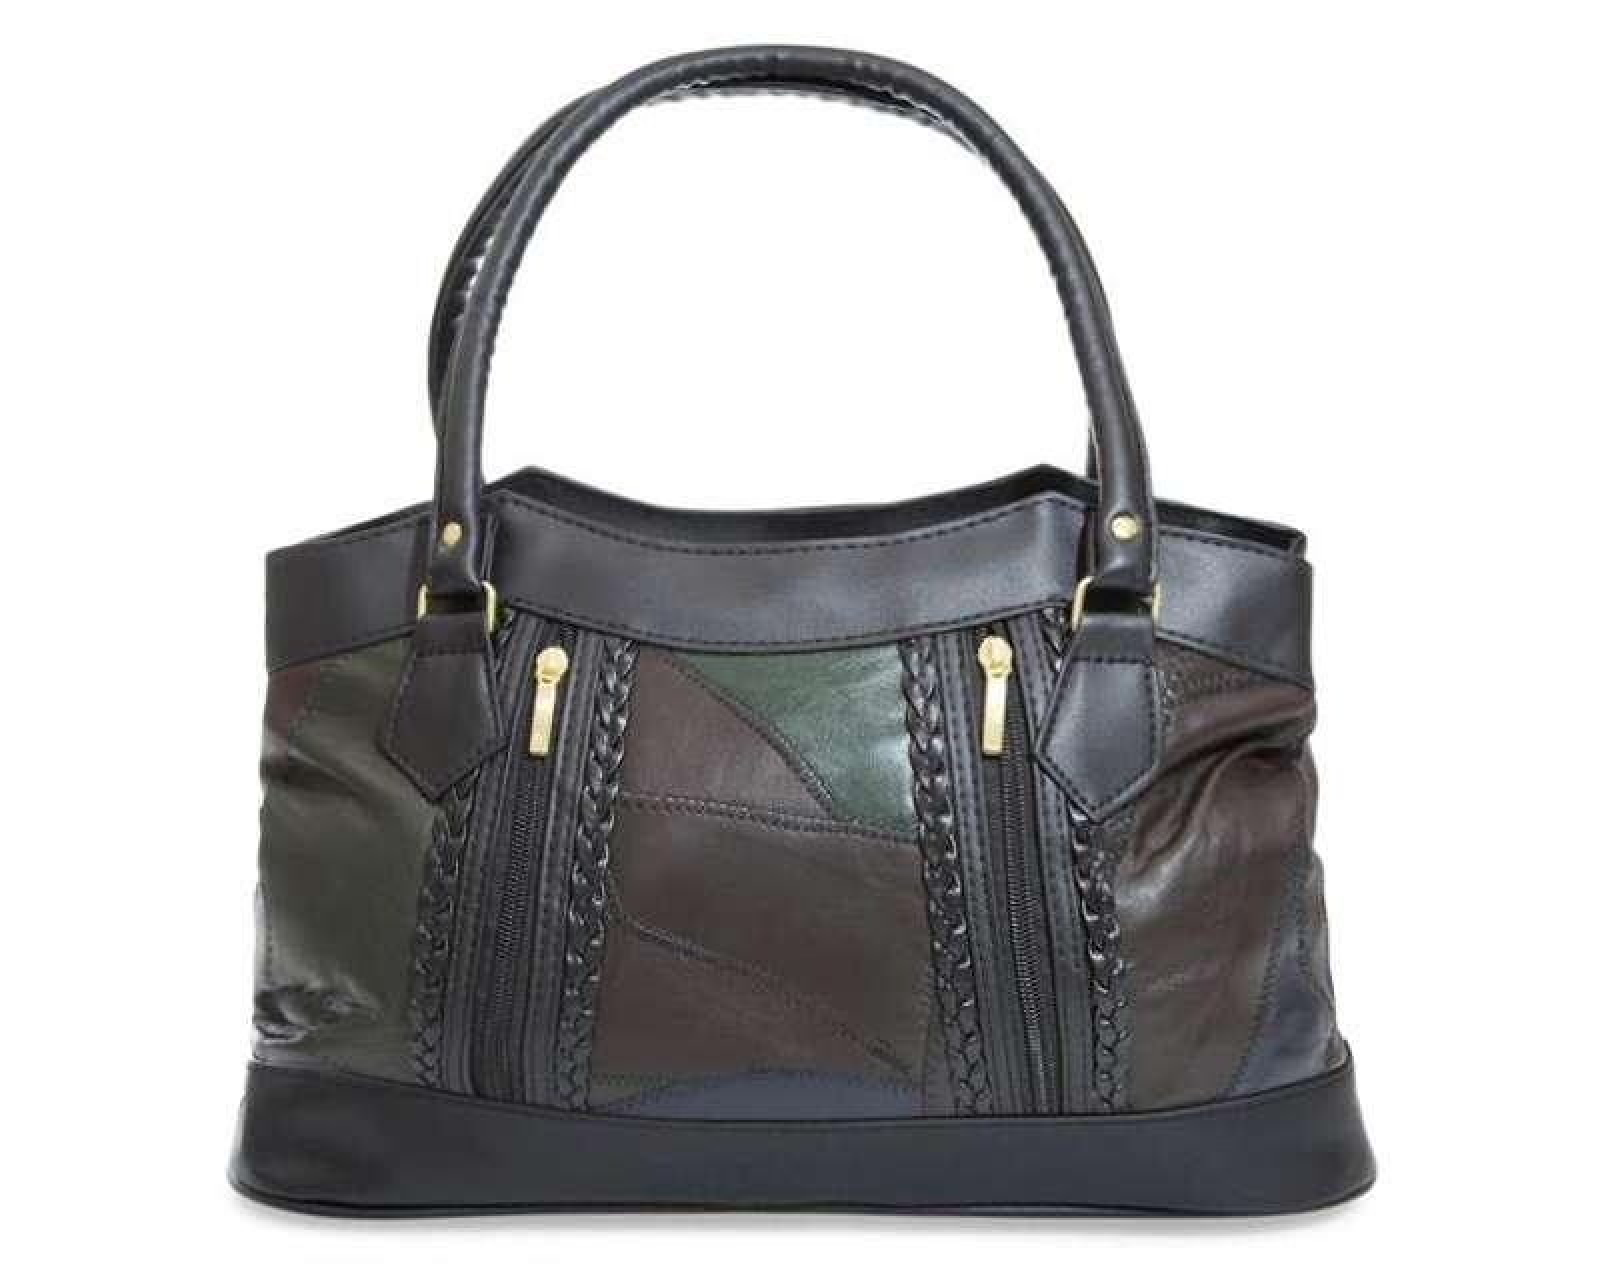 Bolsa de Mano color Negro marca Cora Tosetti para Mujer